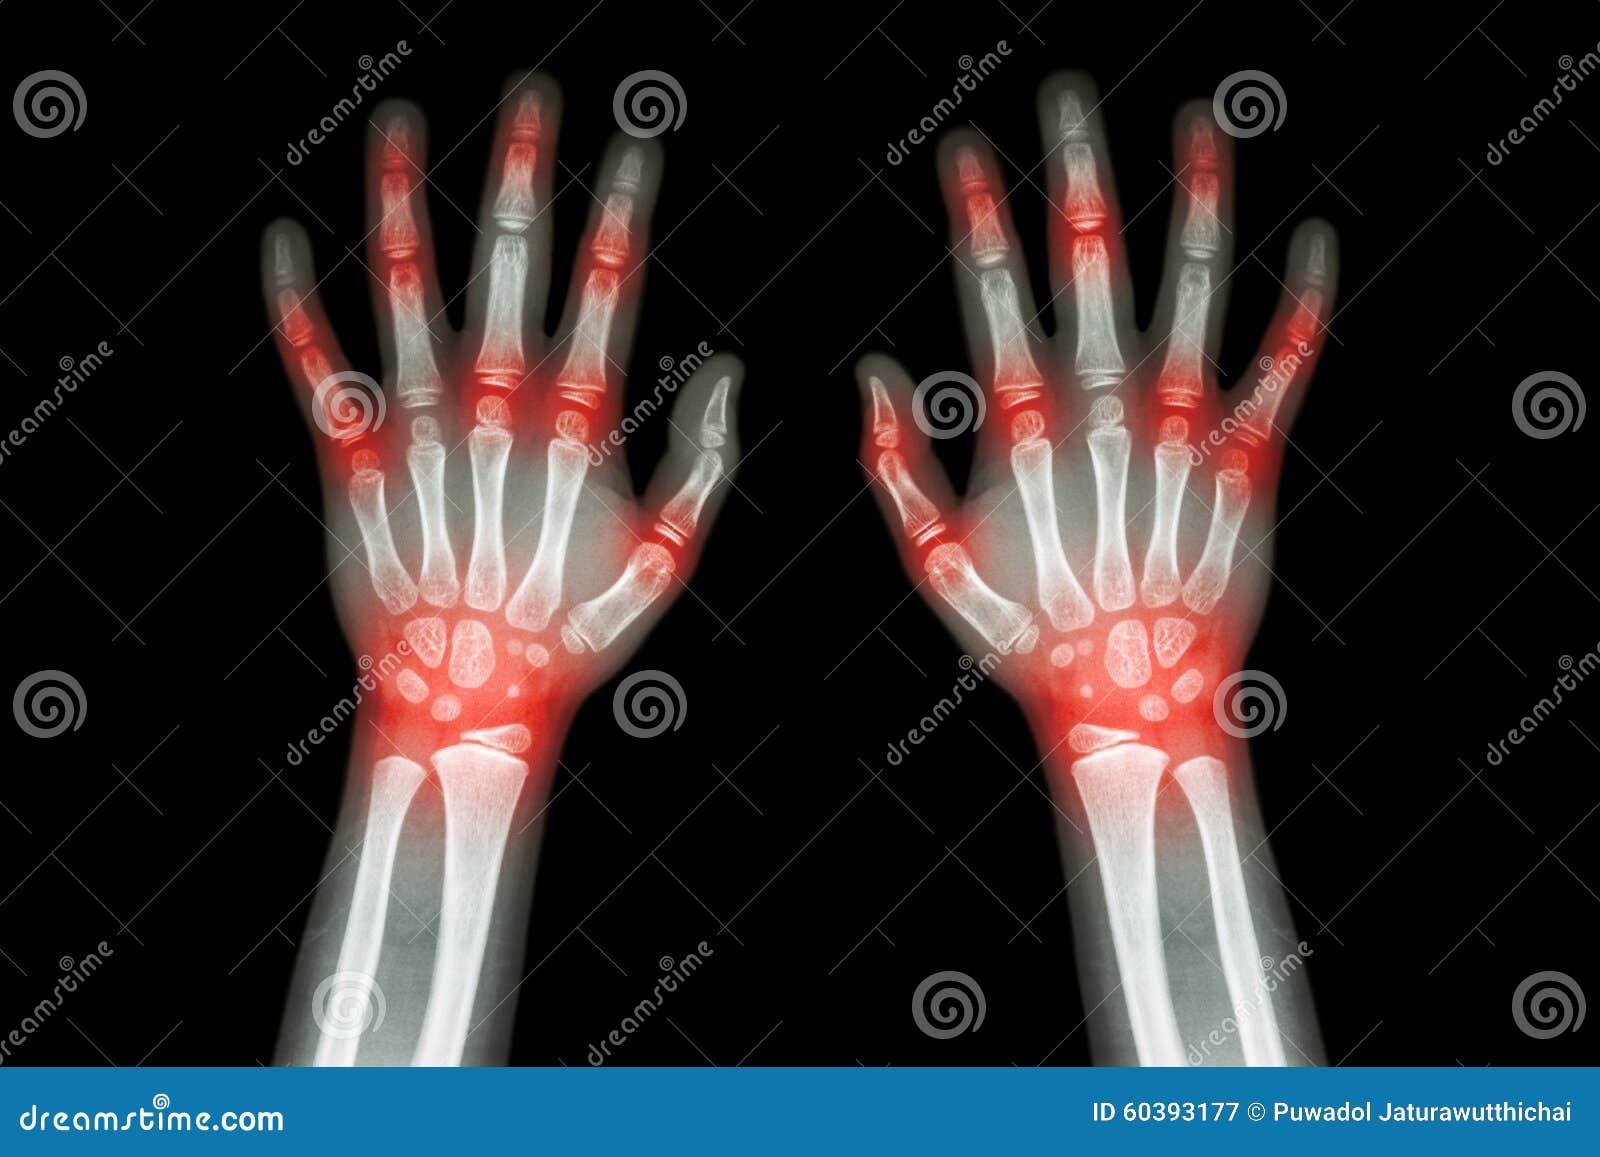 Artritis Reumatoide Artritis De La Gota Radiografía De La Película